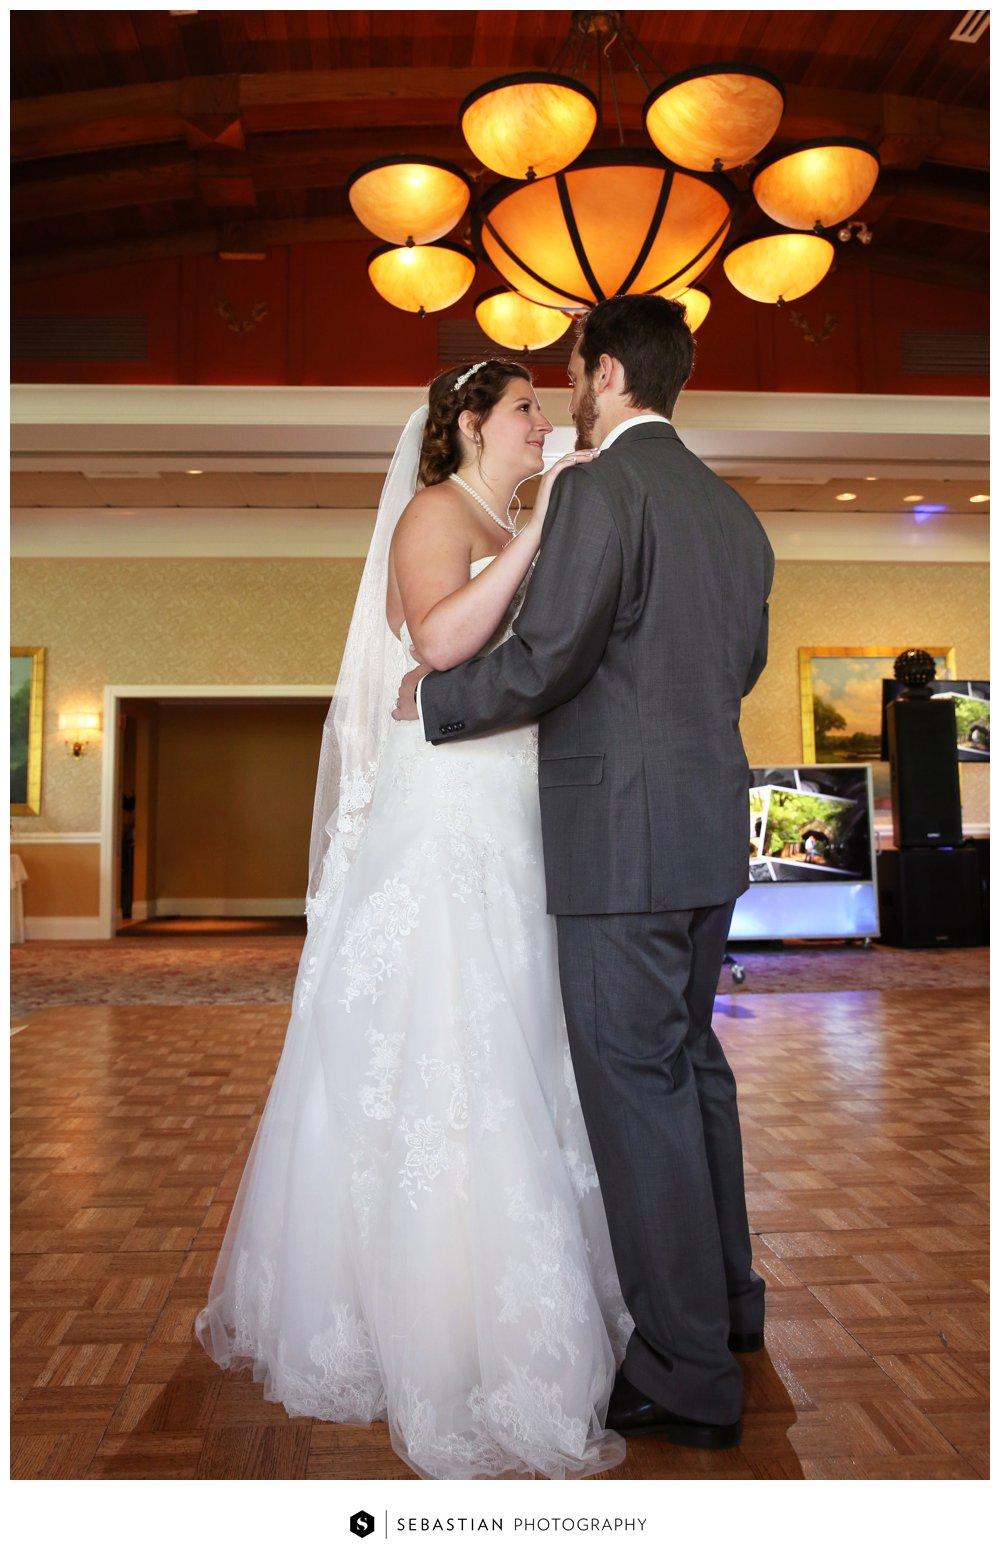 Sebastian Photography_CT Wedding Photographer_Lake of Isles_6061.jpg